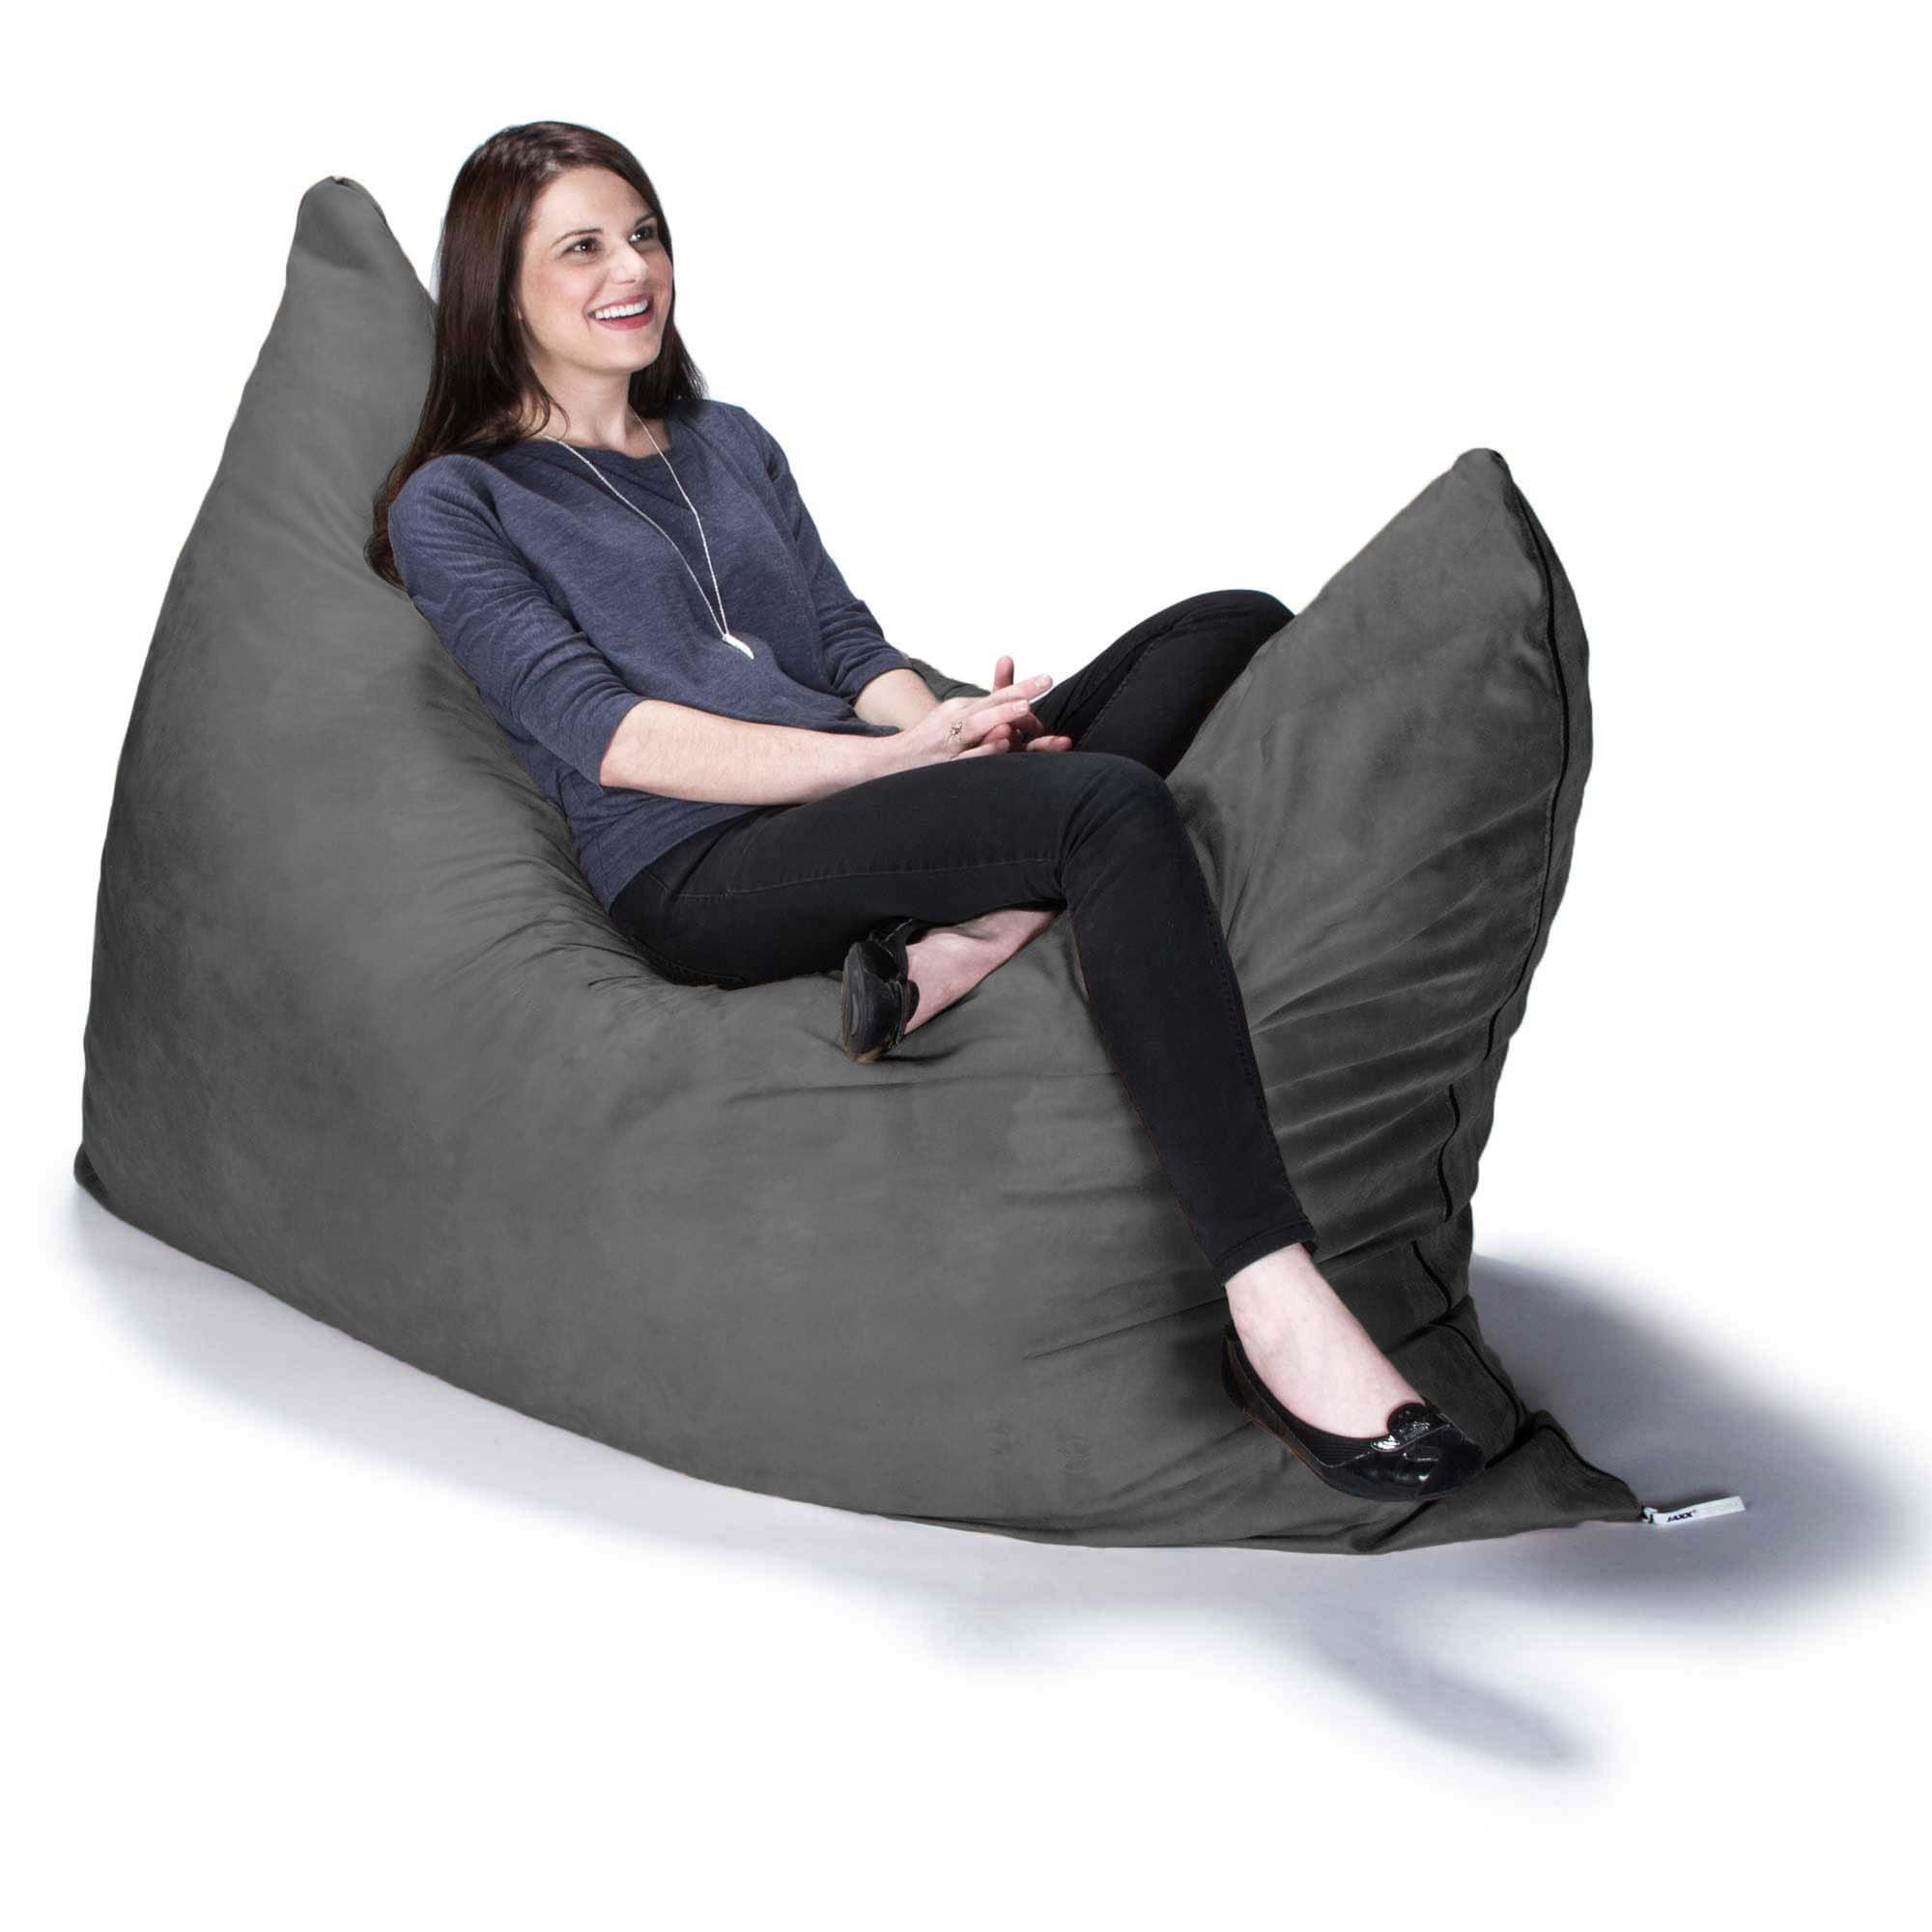 Shop Jaxx 5.5u0027 Pillow Saxx Bean Bag Chair   Free Shipping Today    Overstock.com   6300622